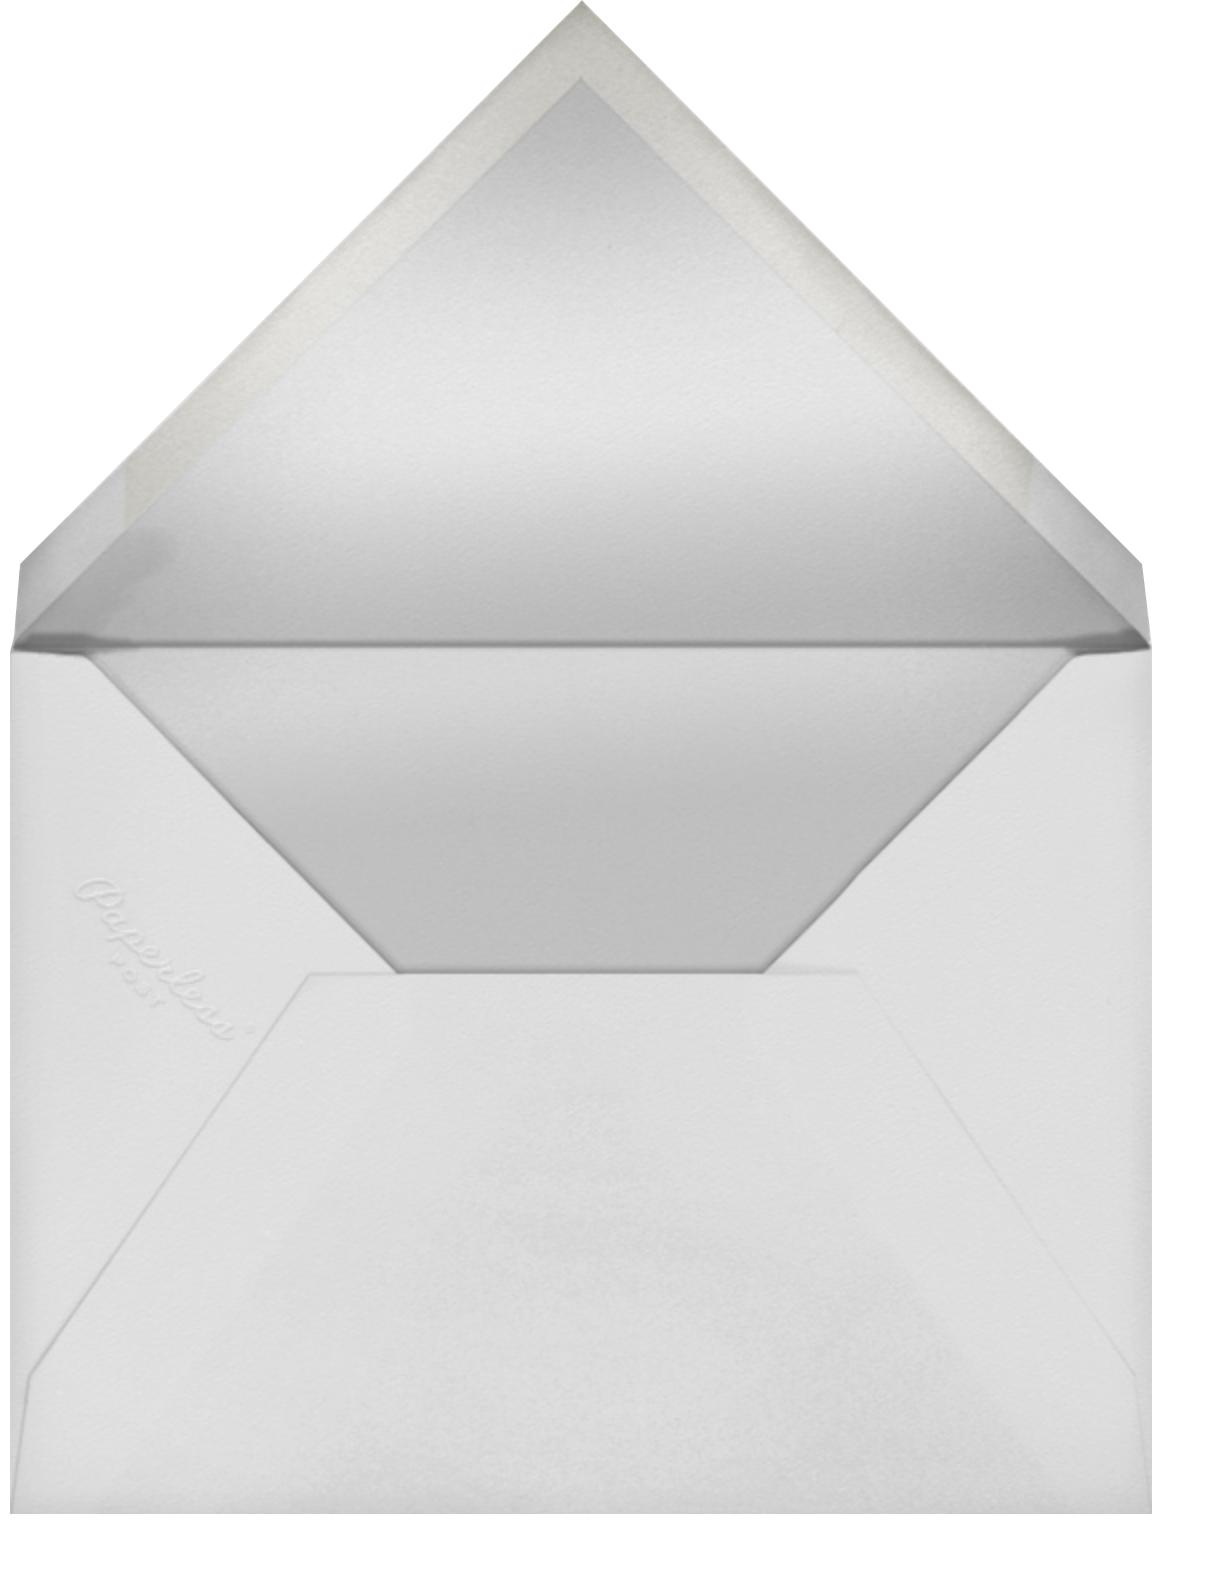 Under the Toran (Menu) - Bright Pink - Paperless Post - Envelope